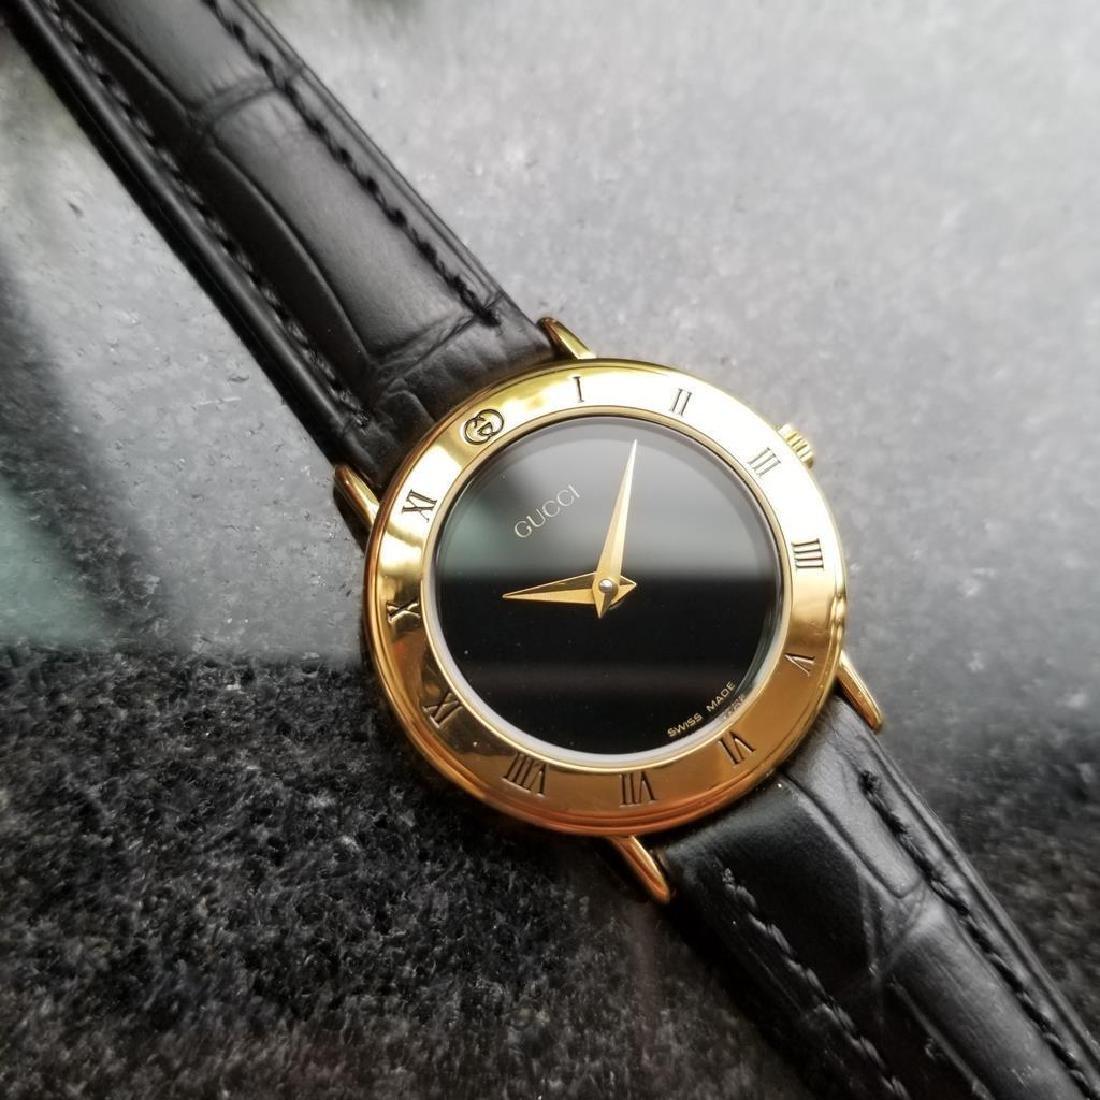 GUCCI Ladies Gold-Plated 3000.2.L Lux Swiss Dress Watch - 3